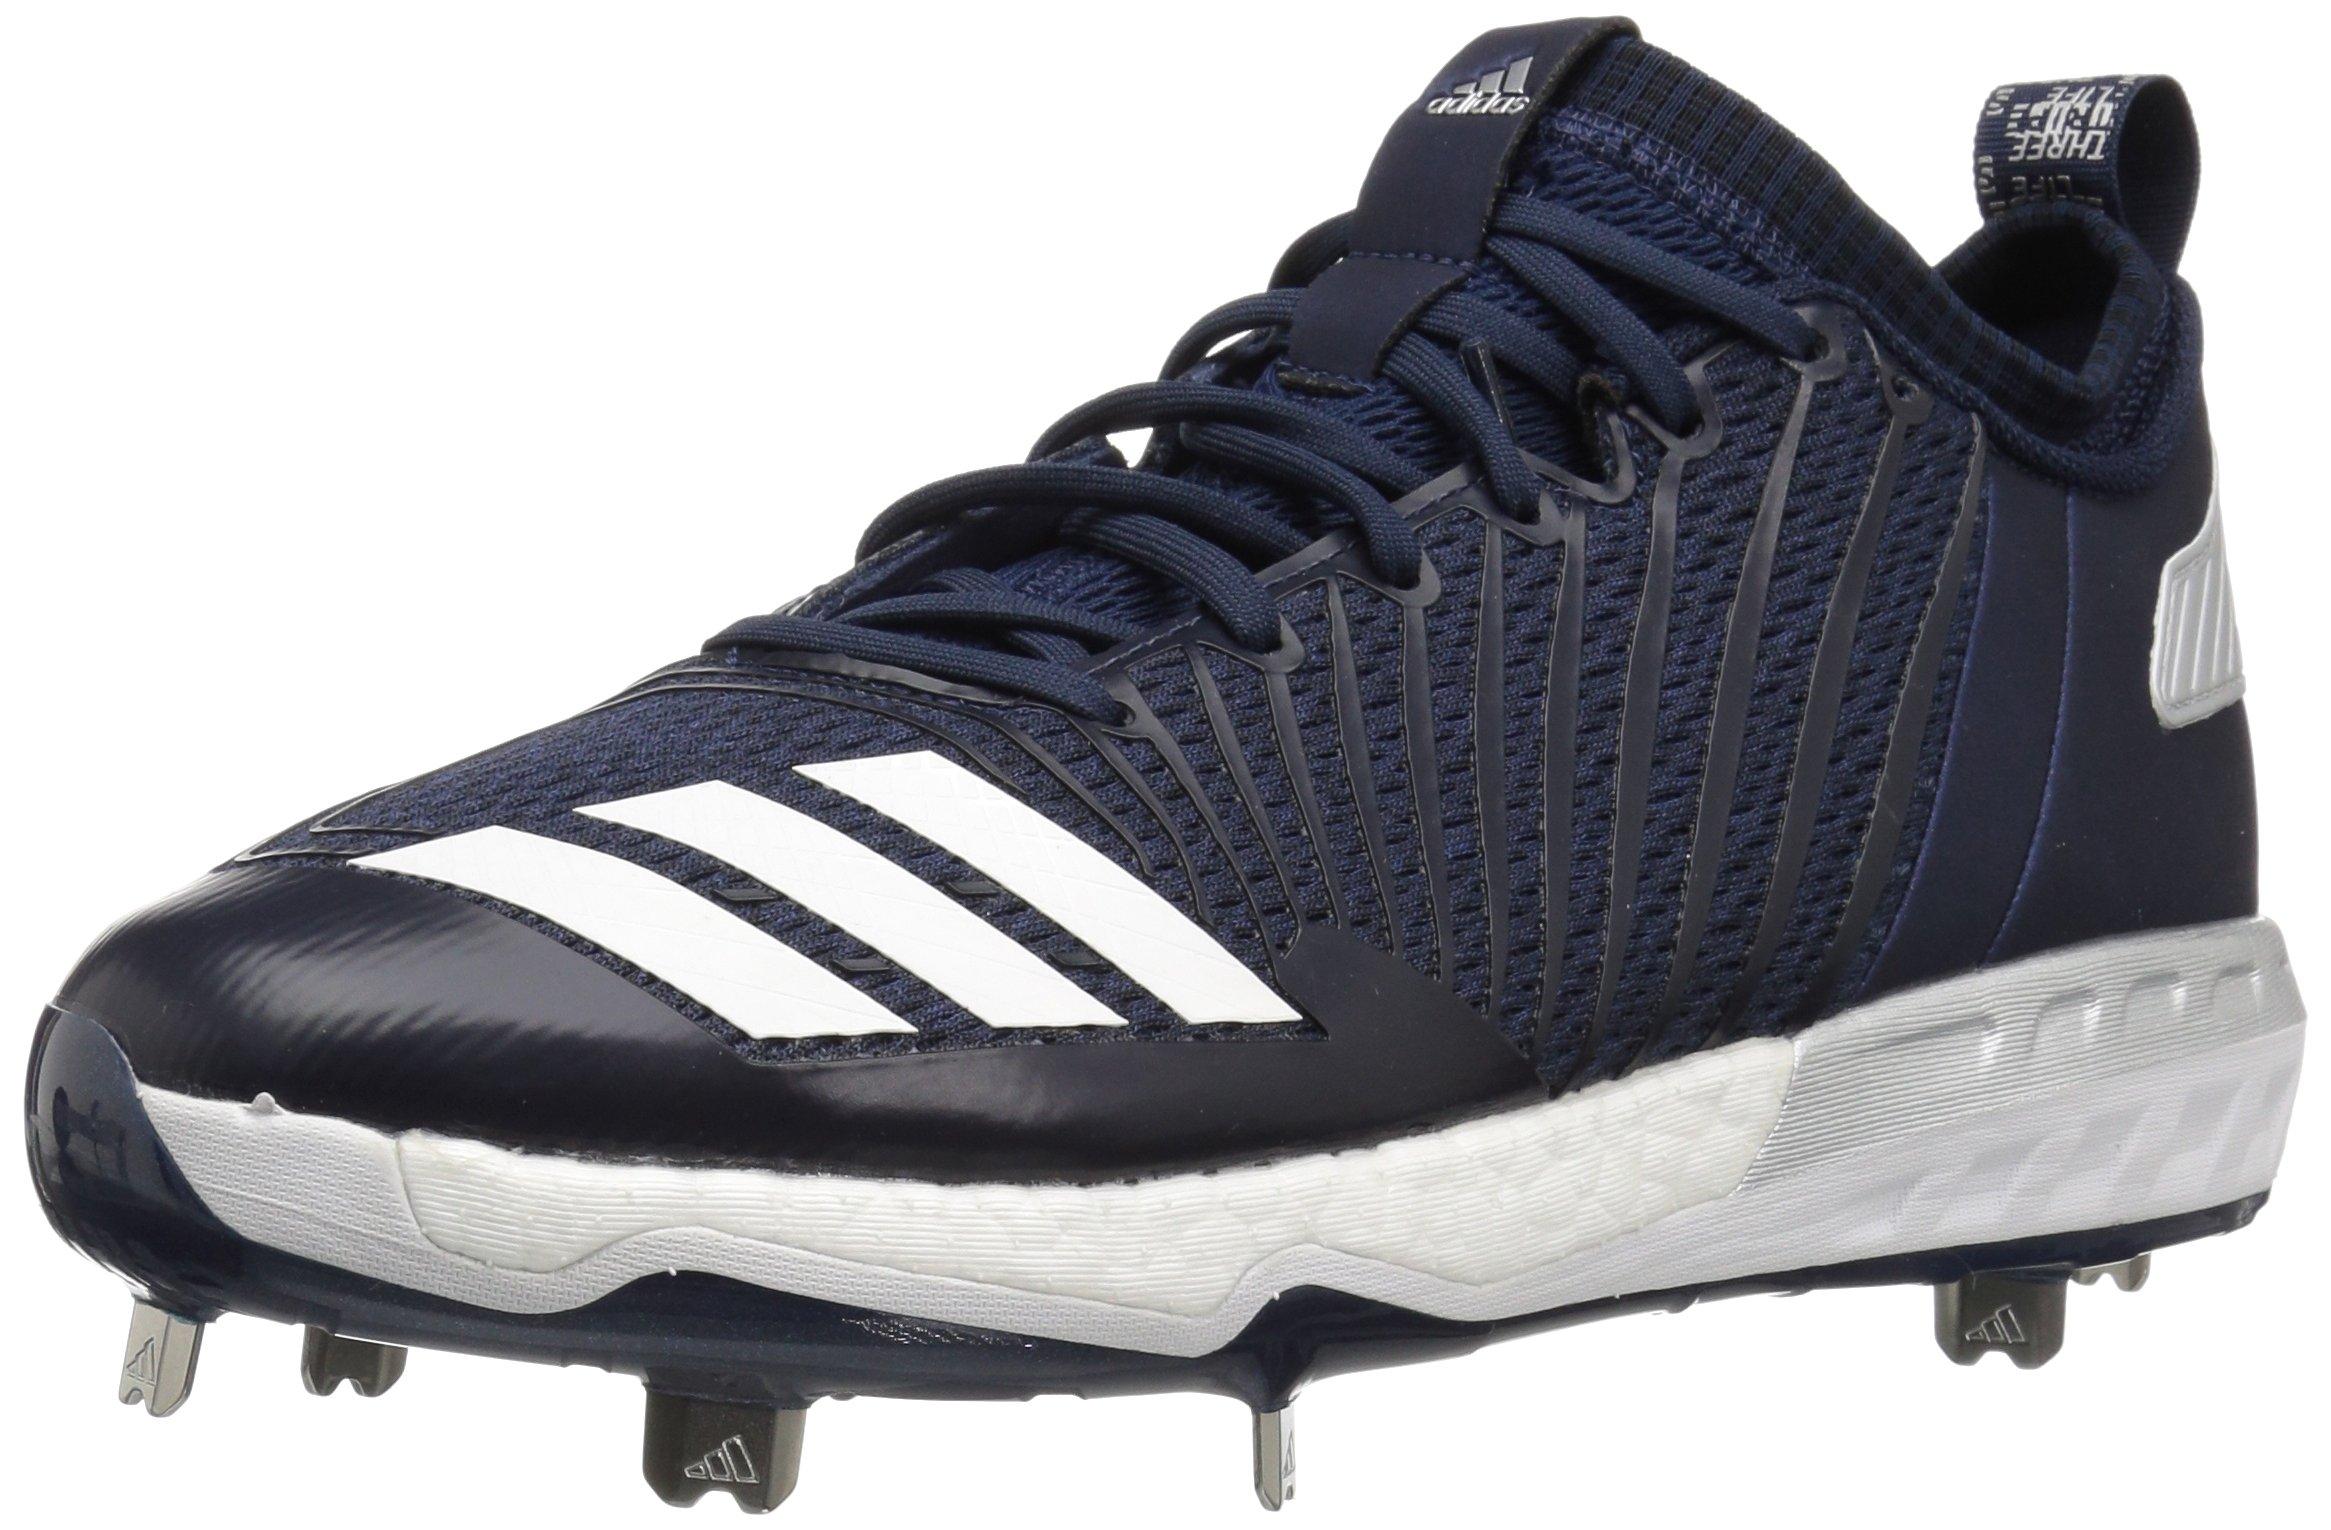 adidas Men's Freak X Carbon Mid Baseball Shoe, Collegiate Navy/White/Metallic Silver, 8 Medium US by adidas (Image #1)